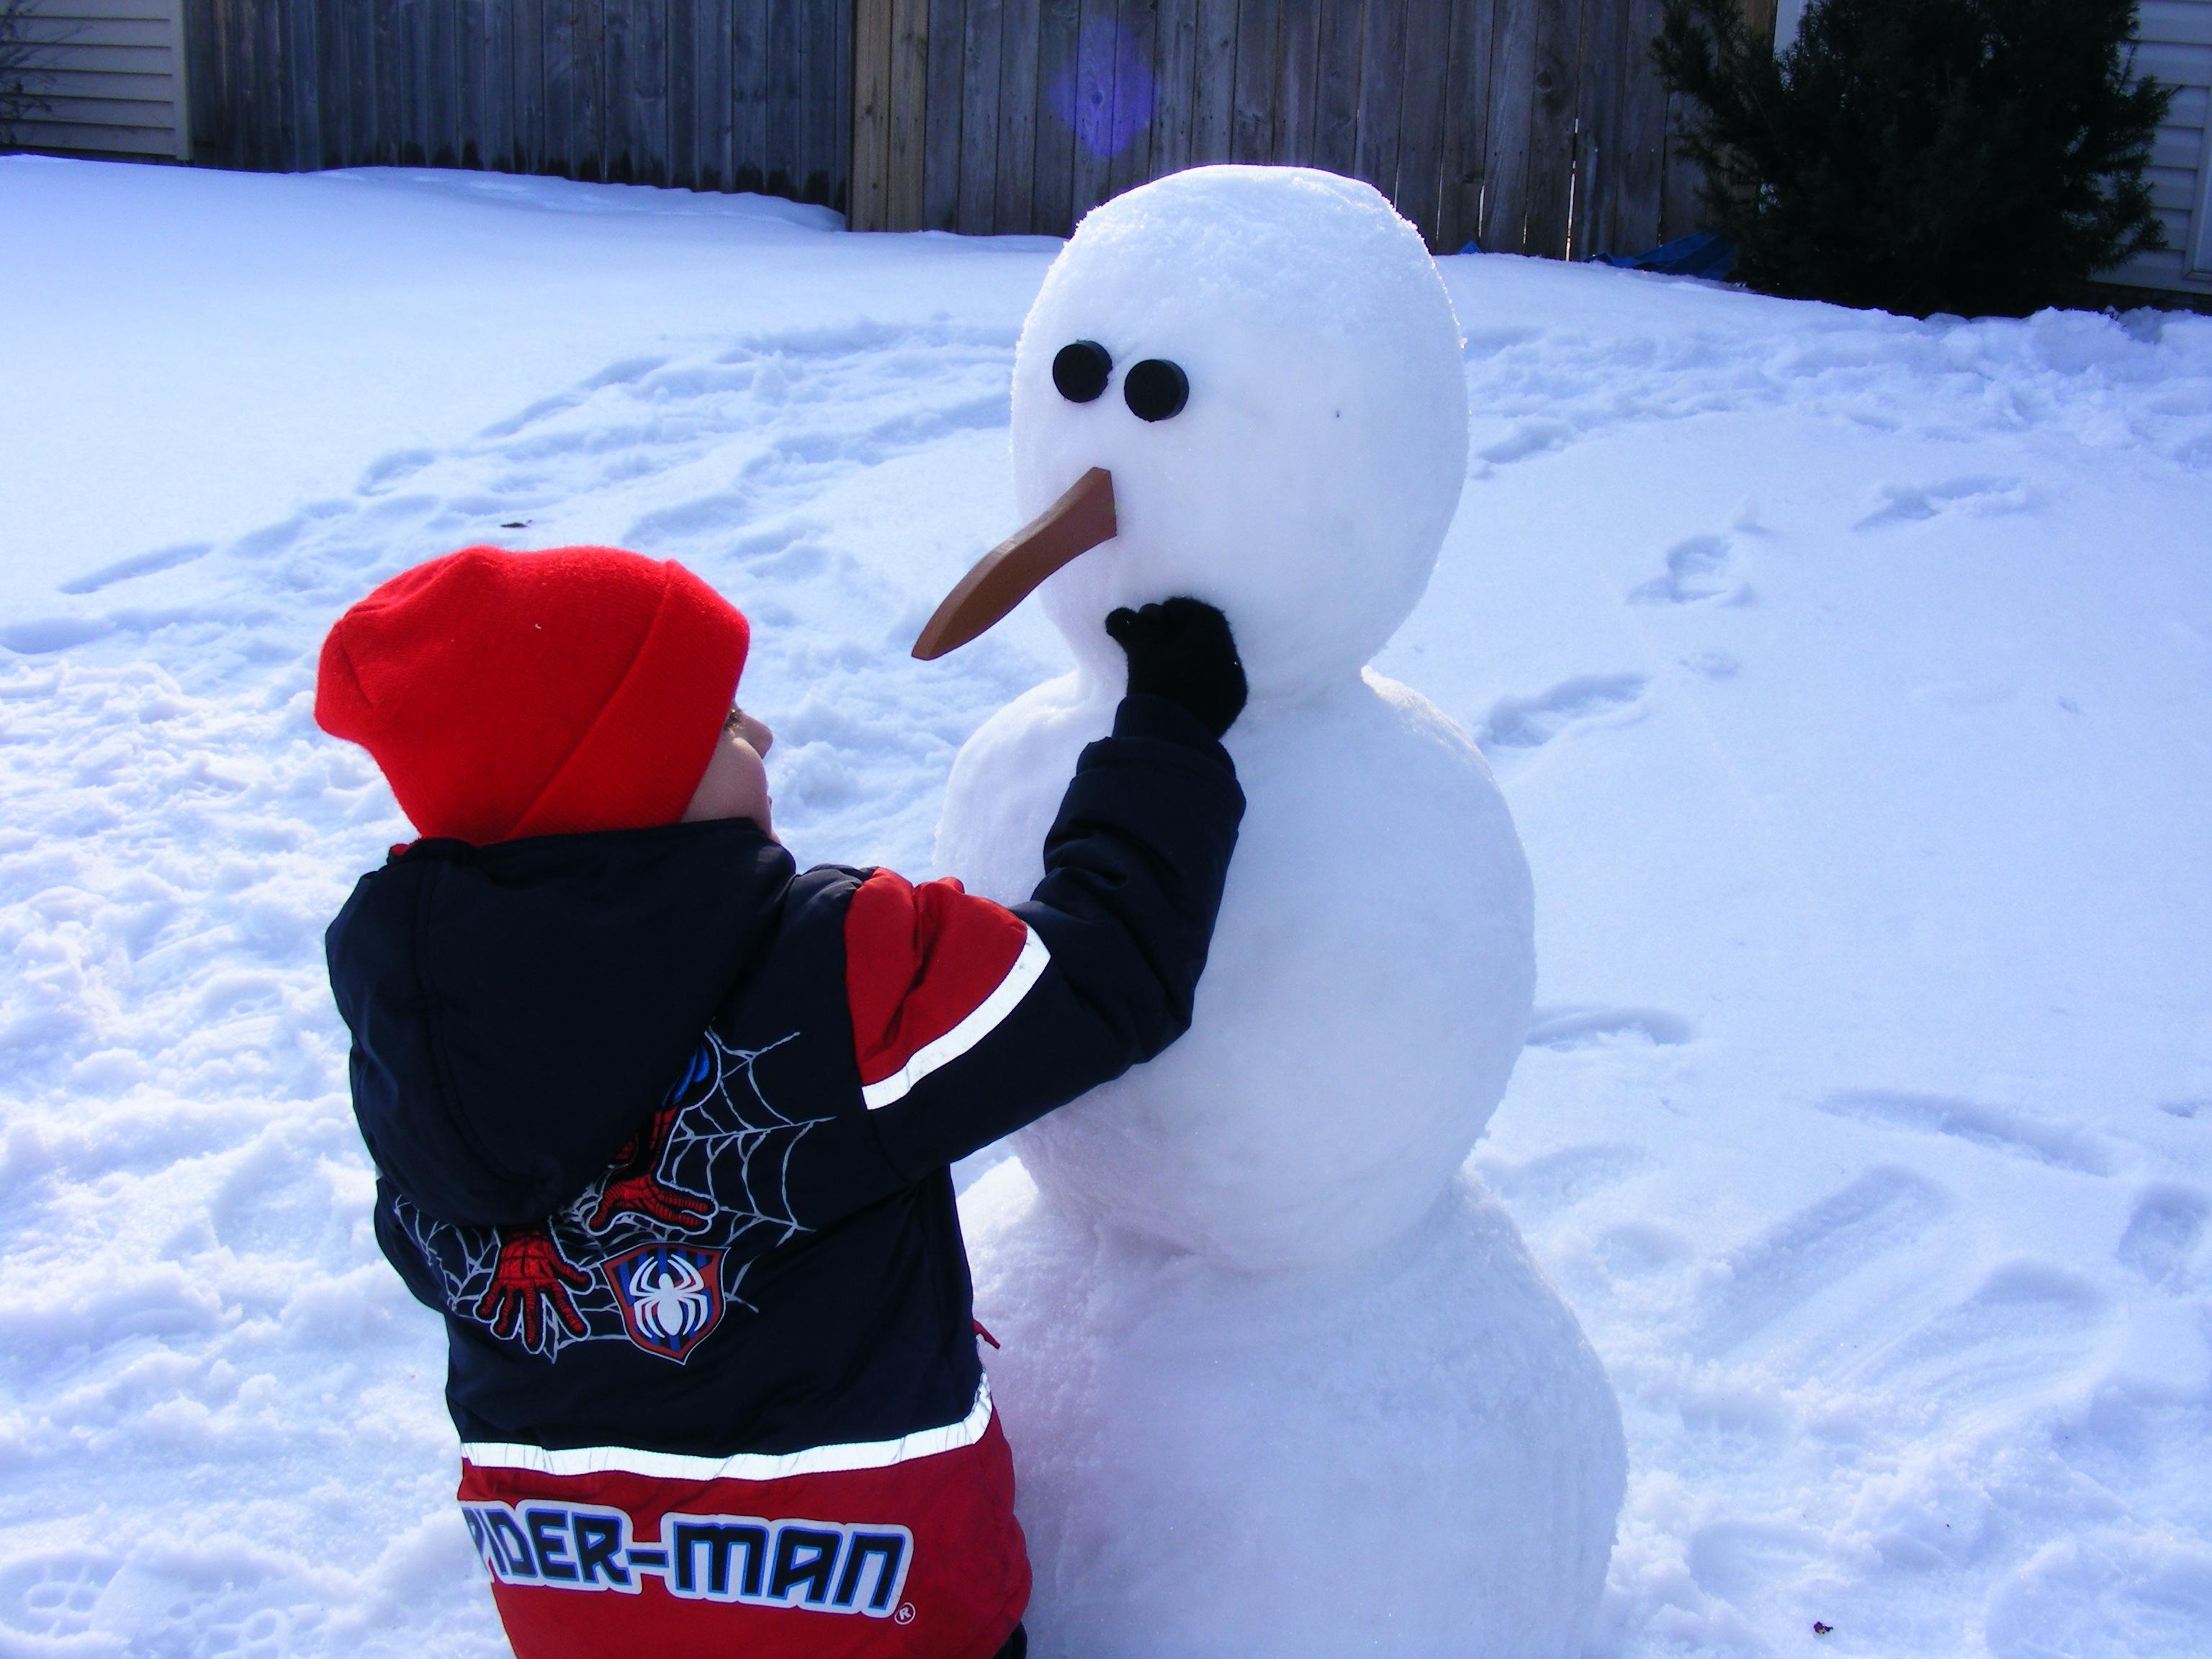 Building-a-snowman-6.jpg